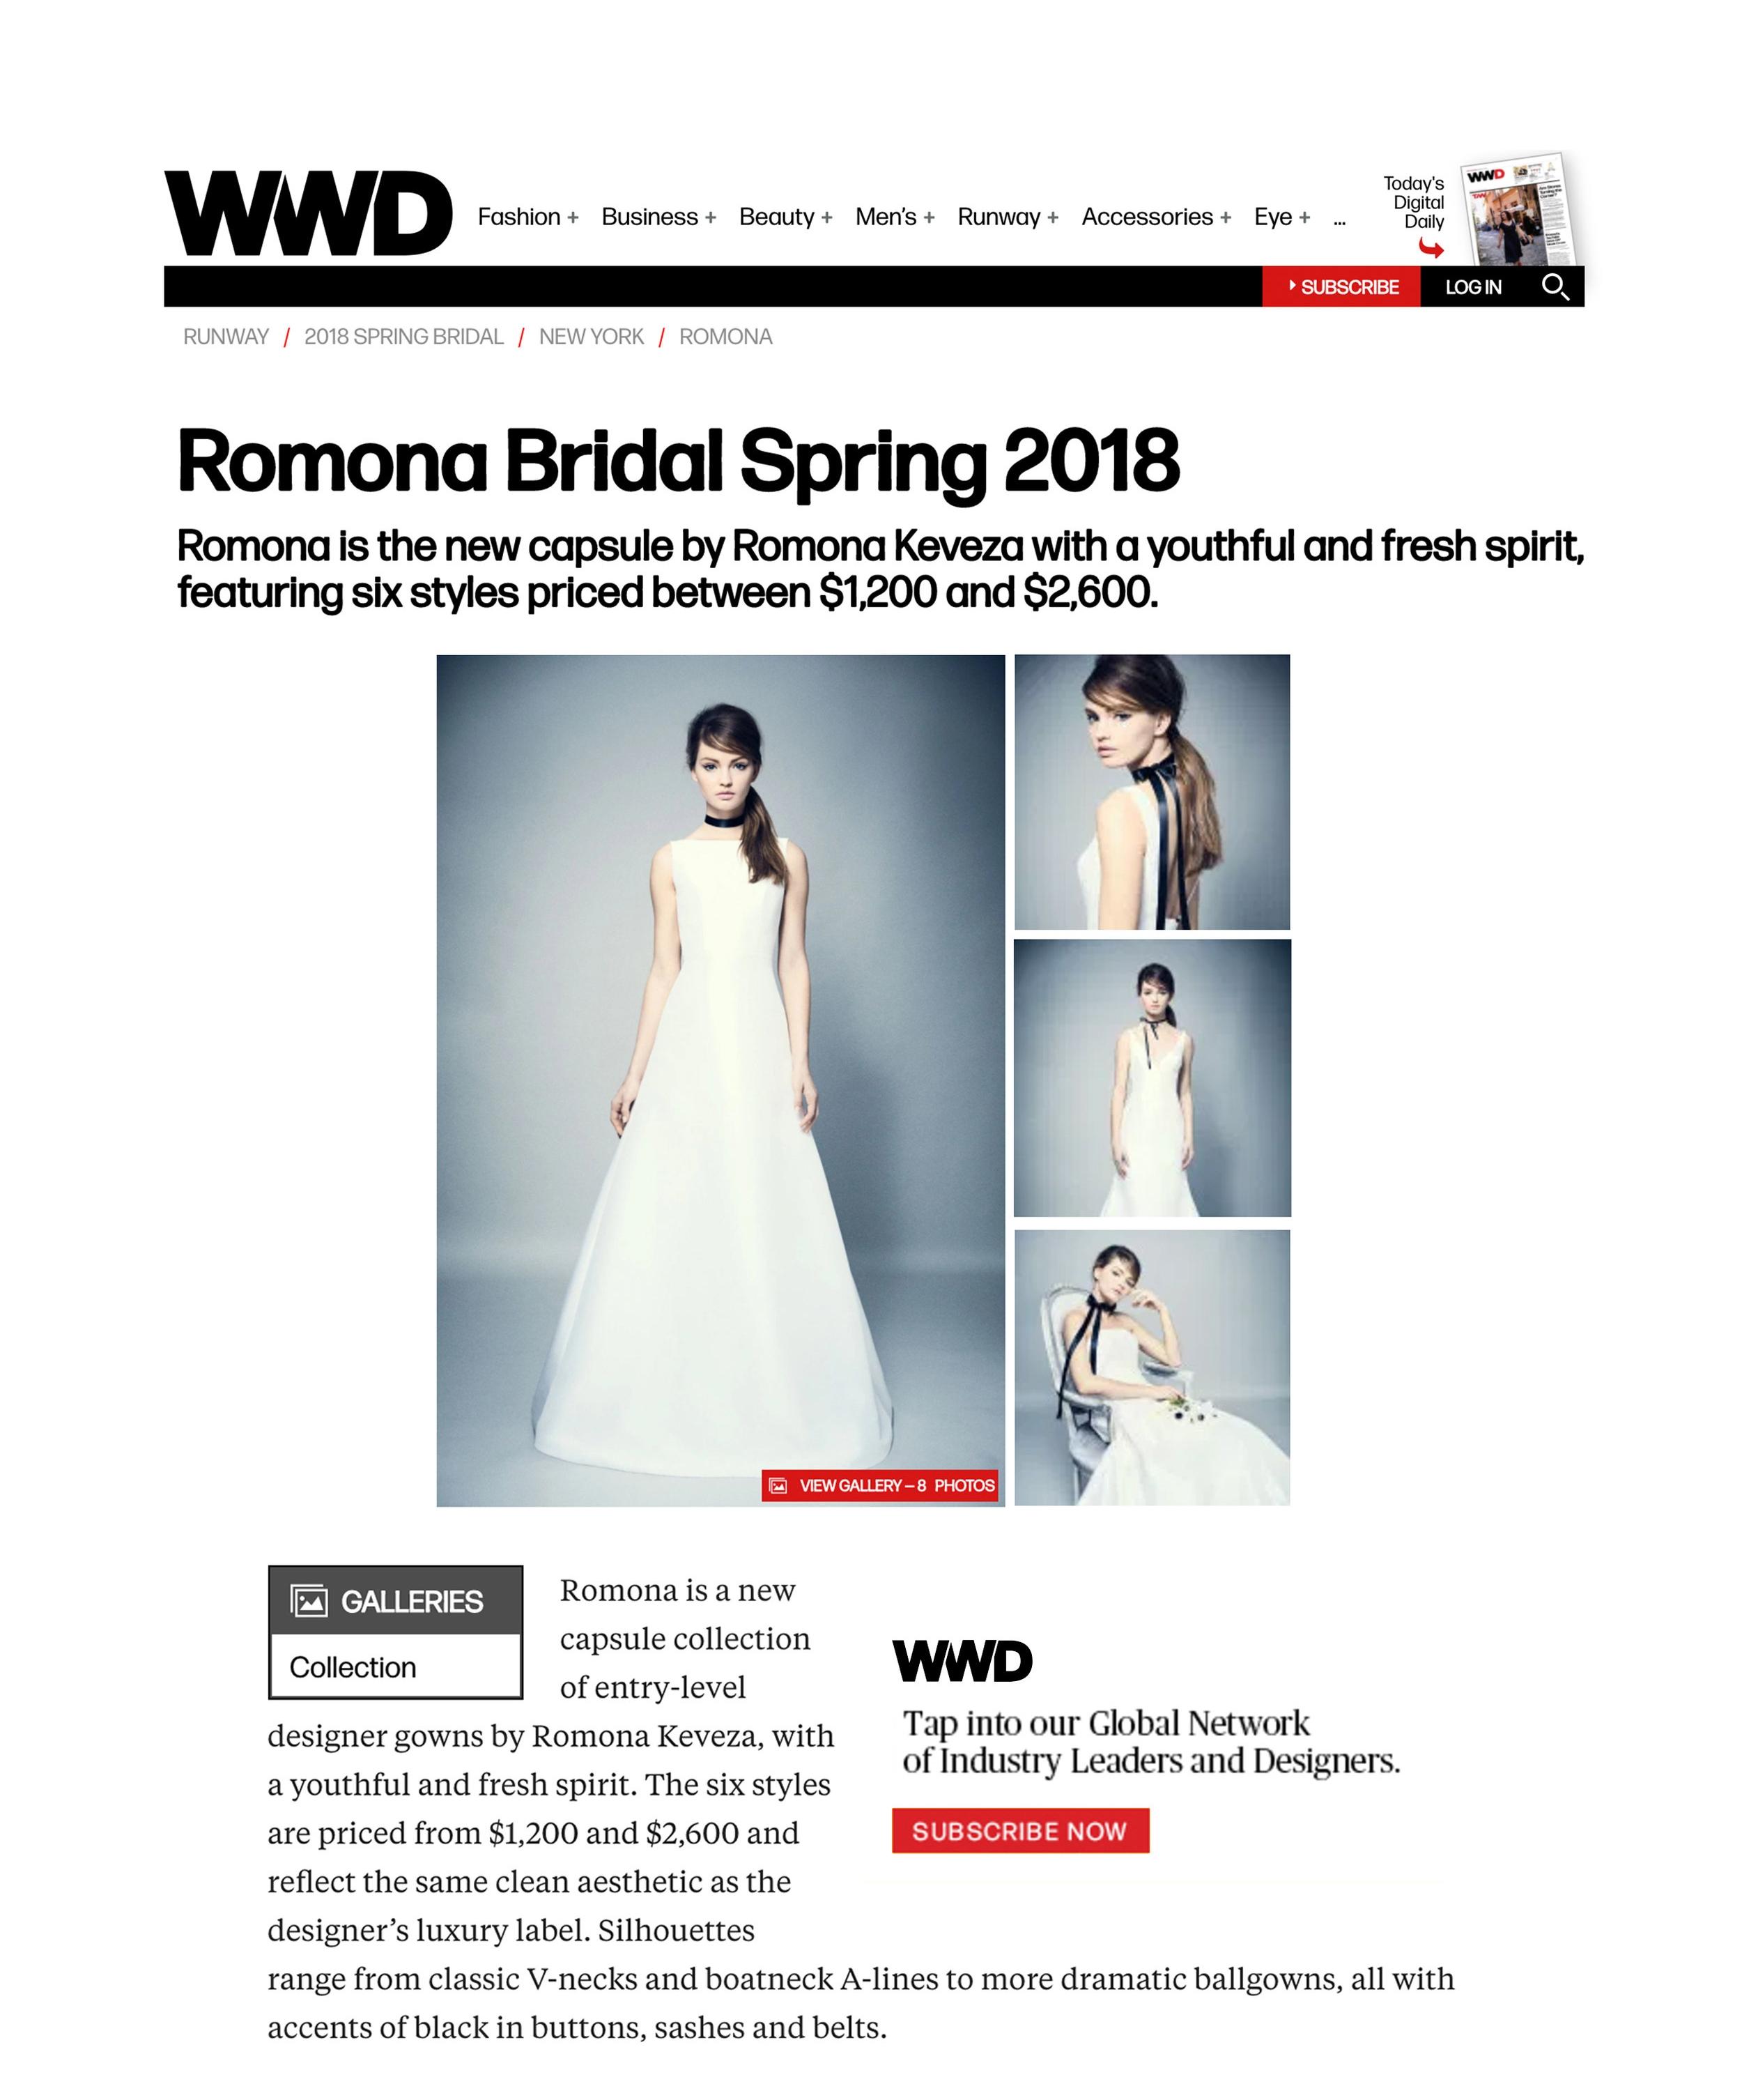 ROMONA_PressKit_WWDPG2NoYellow.jpg